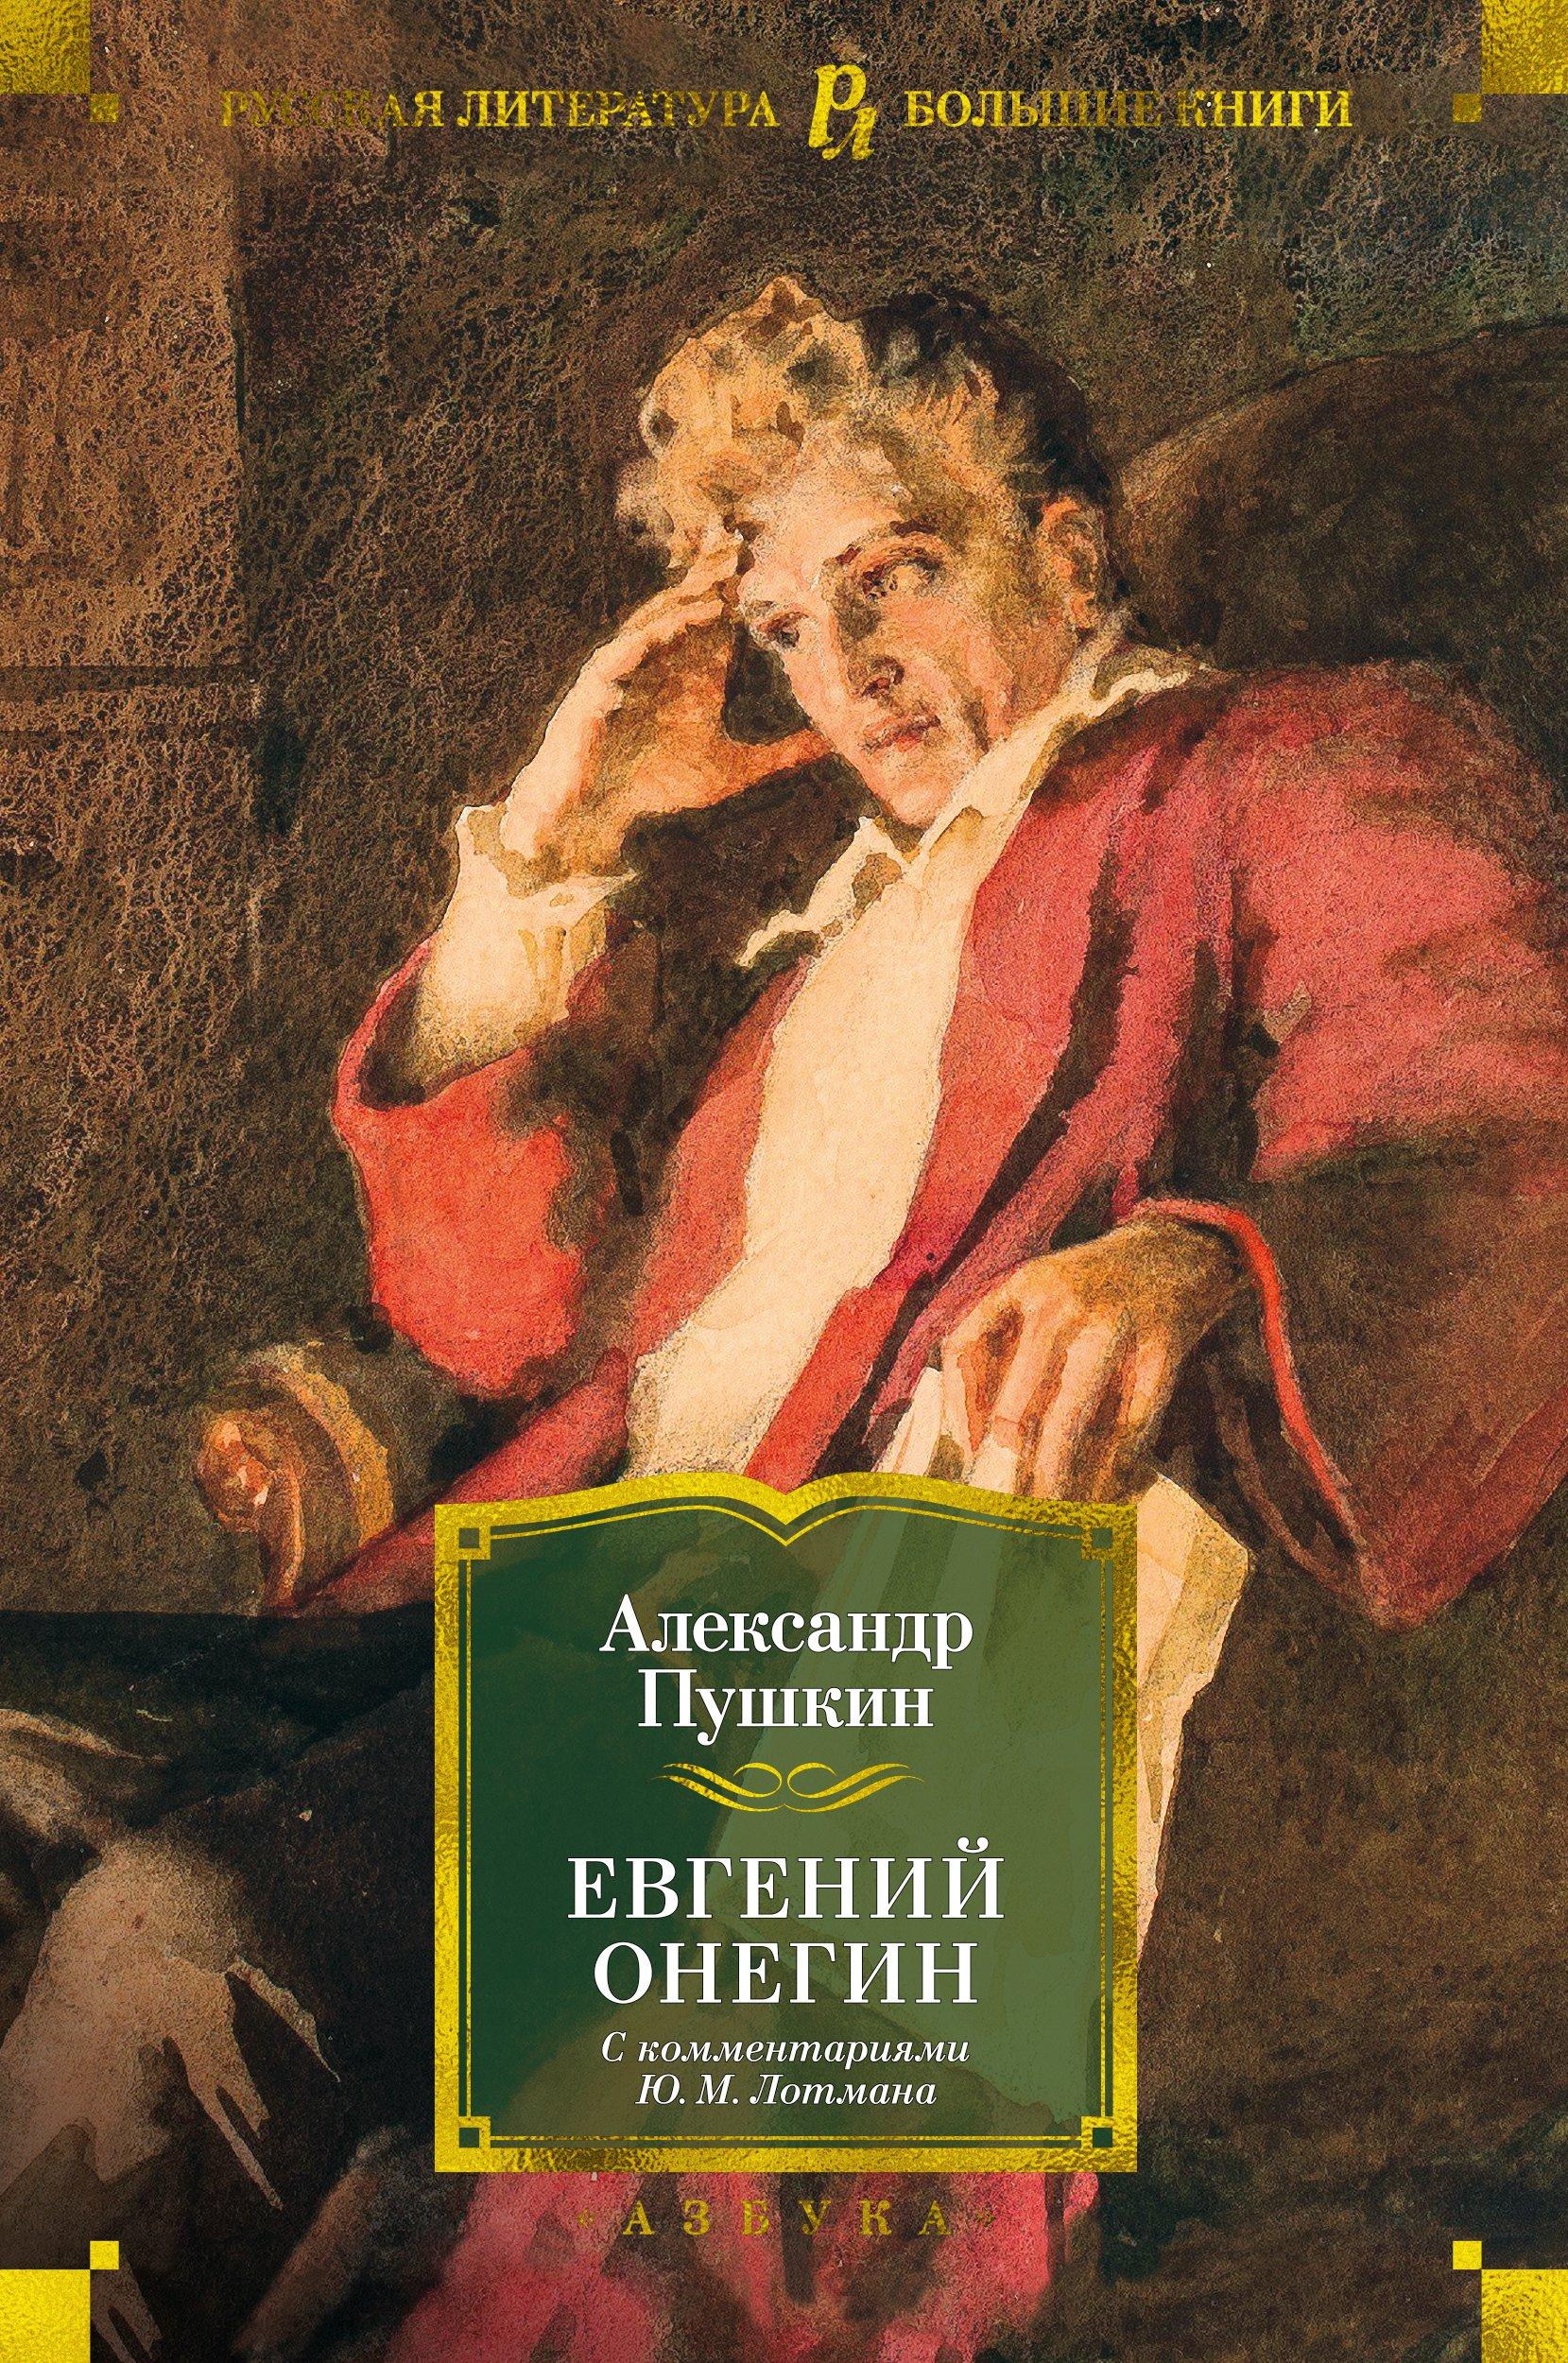 Евгений Онегин (с комментариями Ю.М. Лотмана)